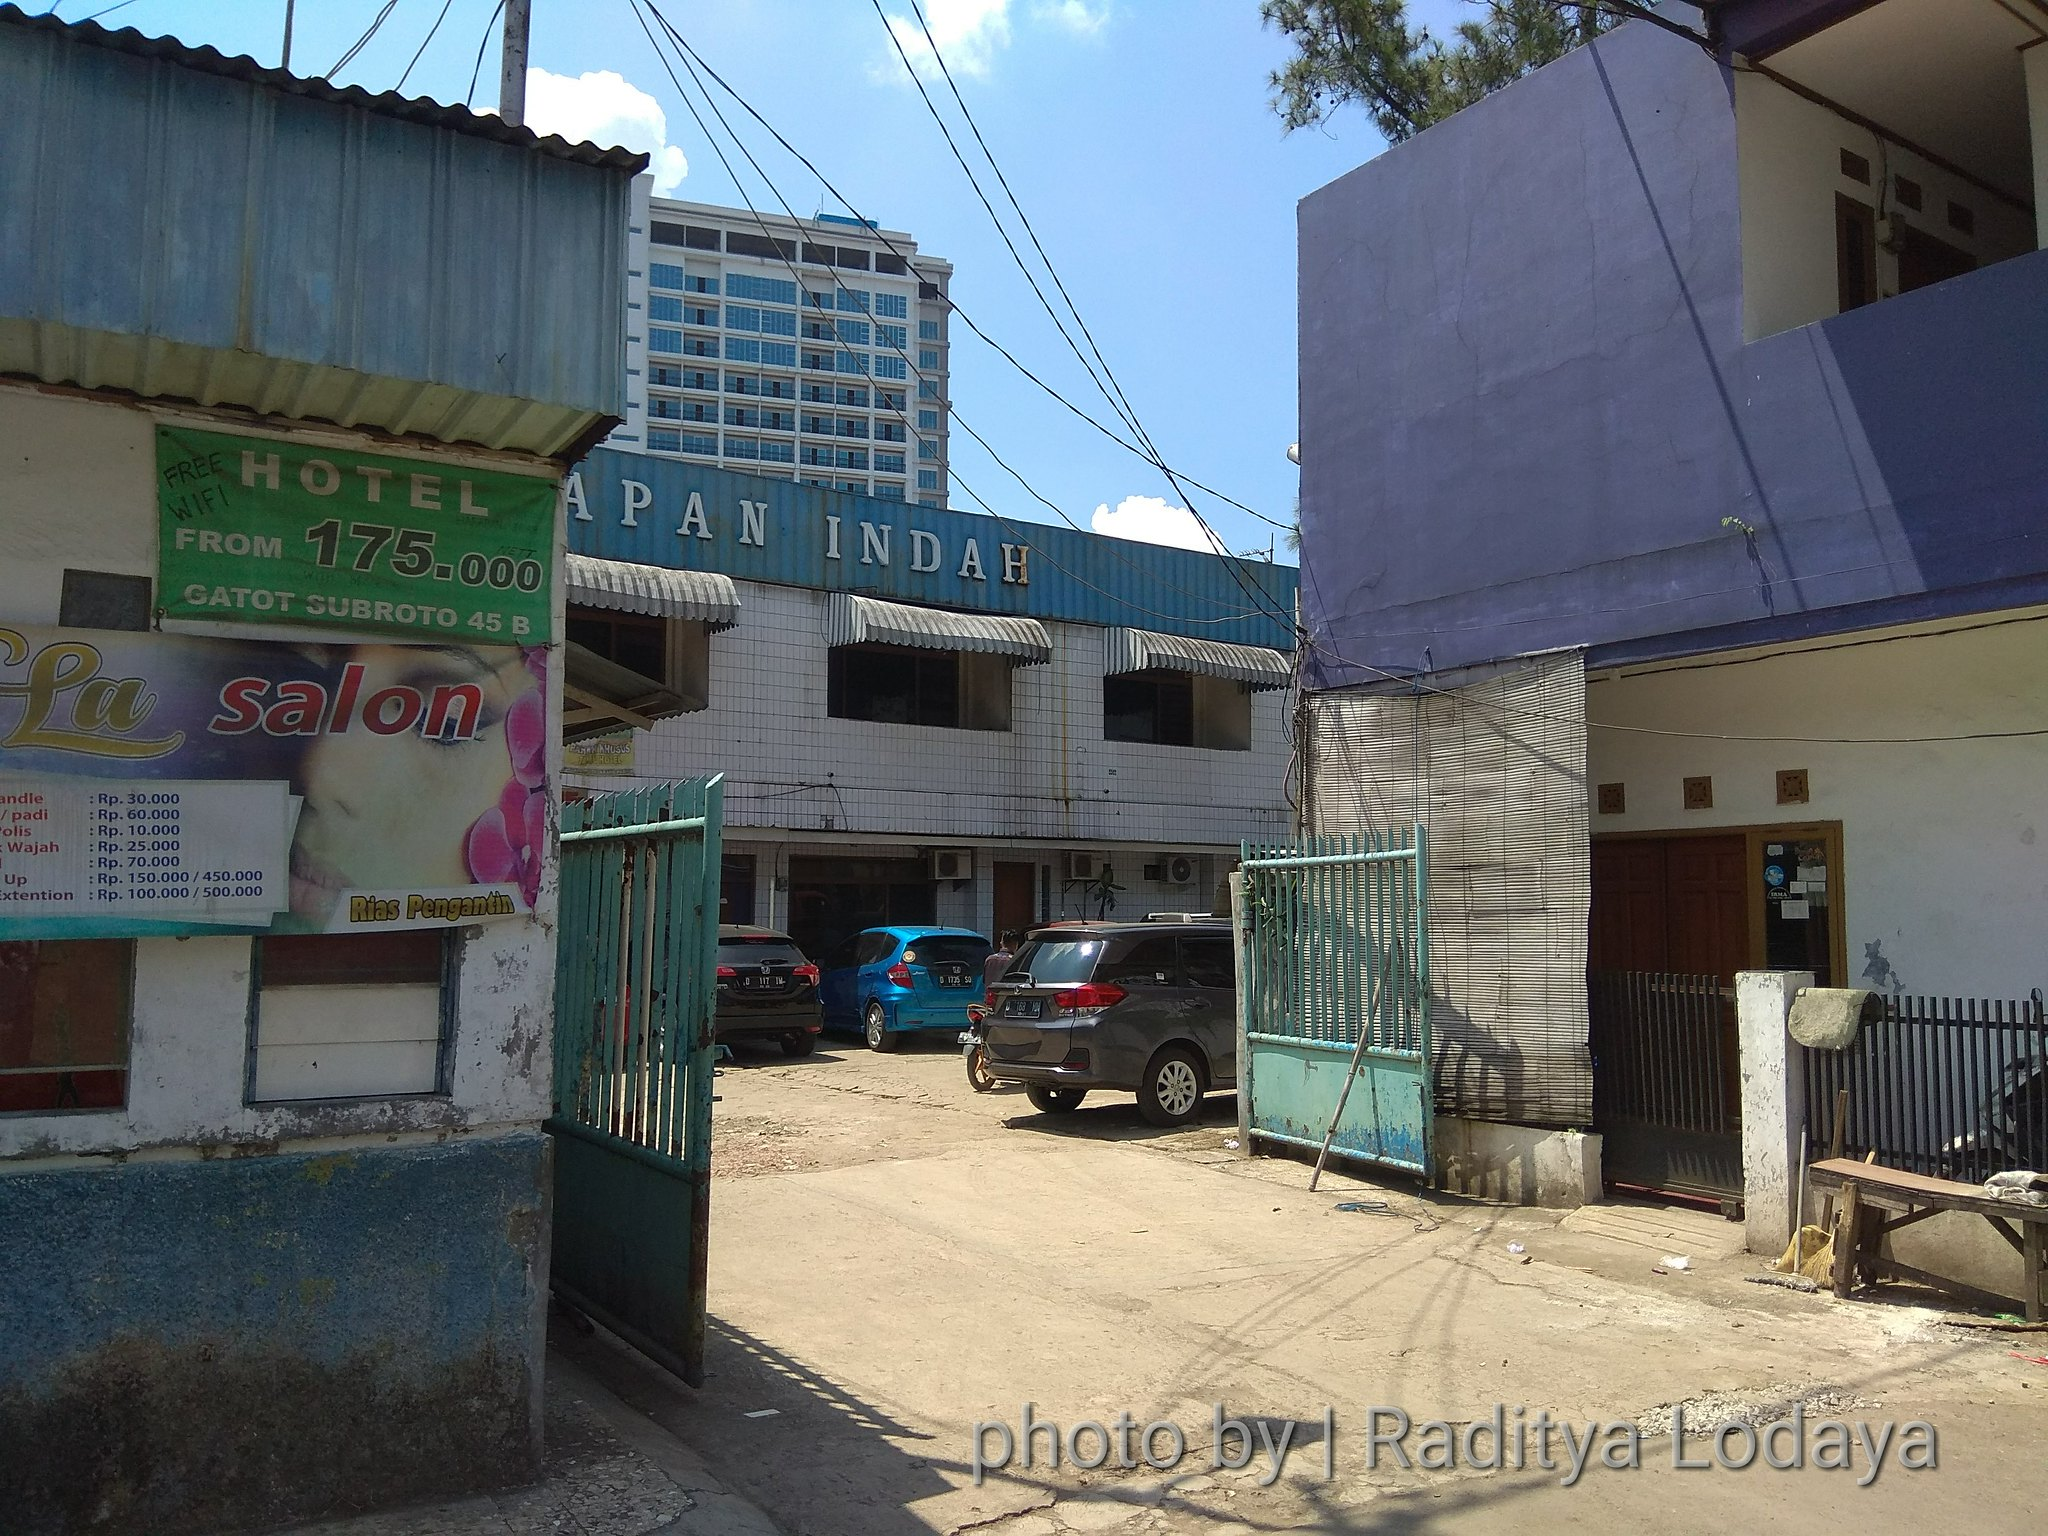 Foto Jalur Rel Mati Bandung (Kiaracondong Karees) 41 - Jalan Malabar 1 yang diduga bekas jalur kereta api Kiaracondong Karees berakhir dekat hotel Harapan Indah